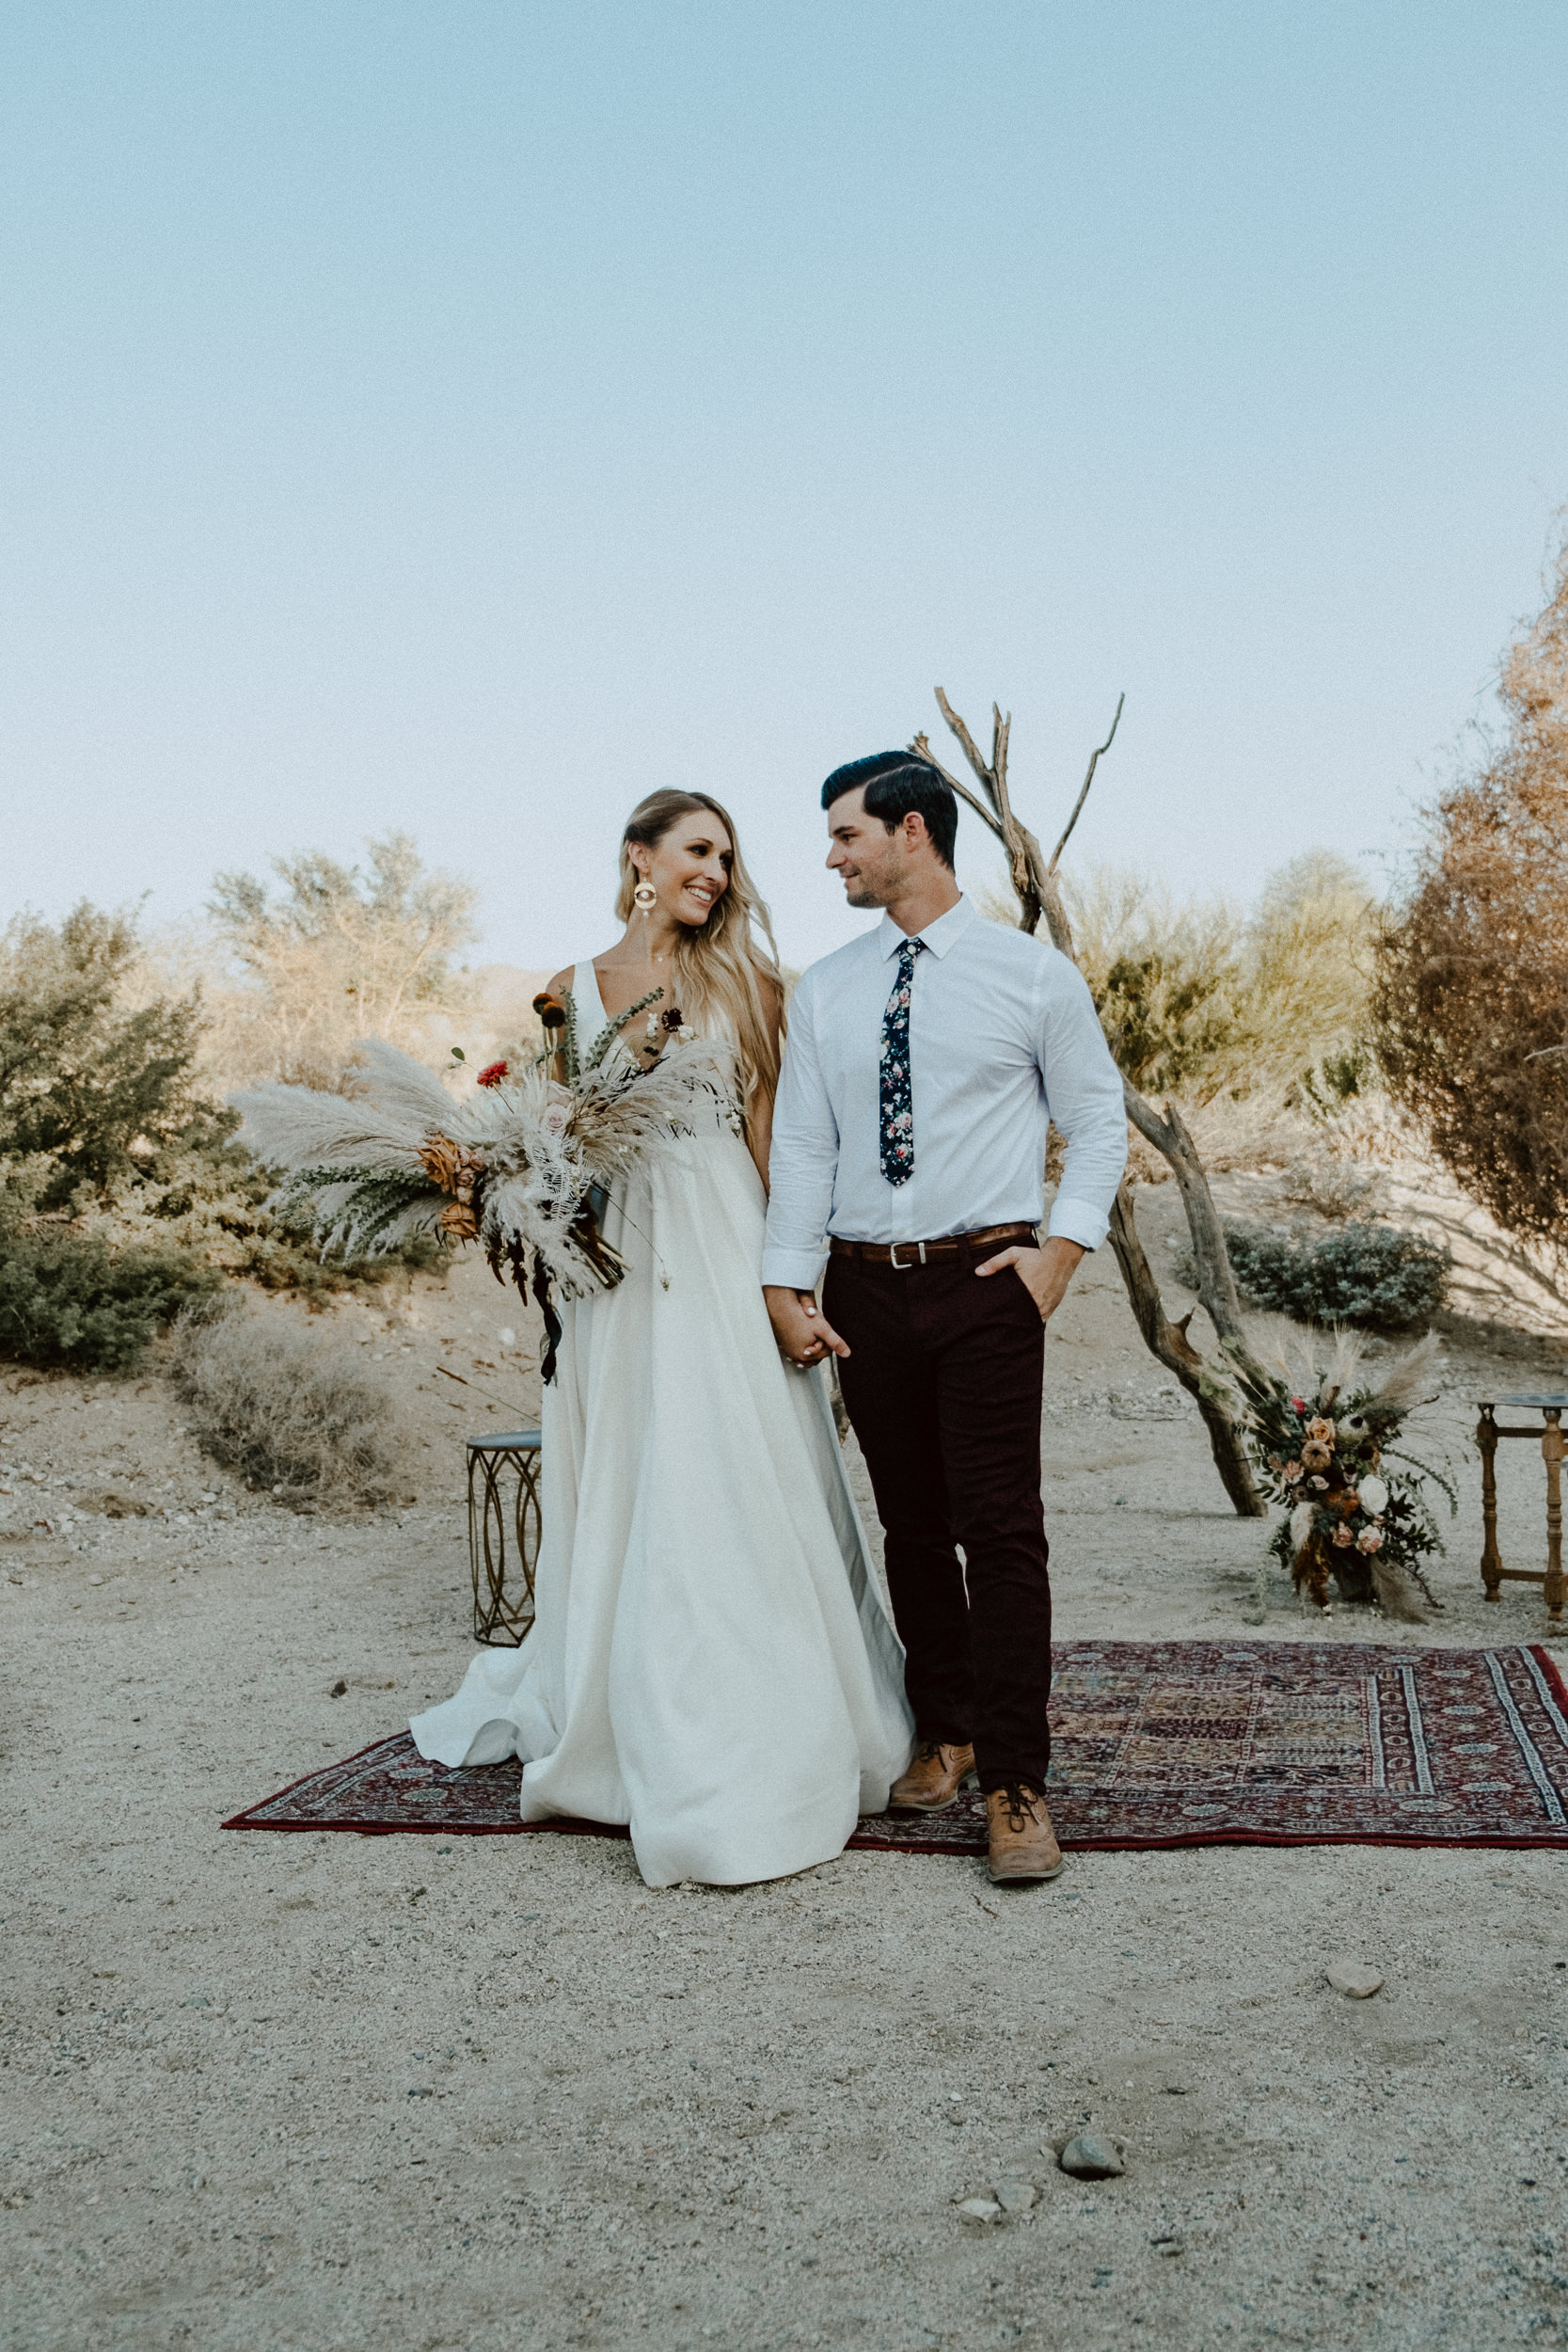 sChelsie + Chris - The Desert Shootout Wedding Romantics at The Living Desert-6.jpg